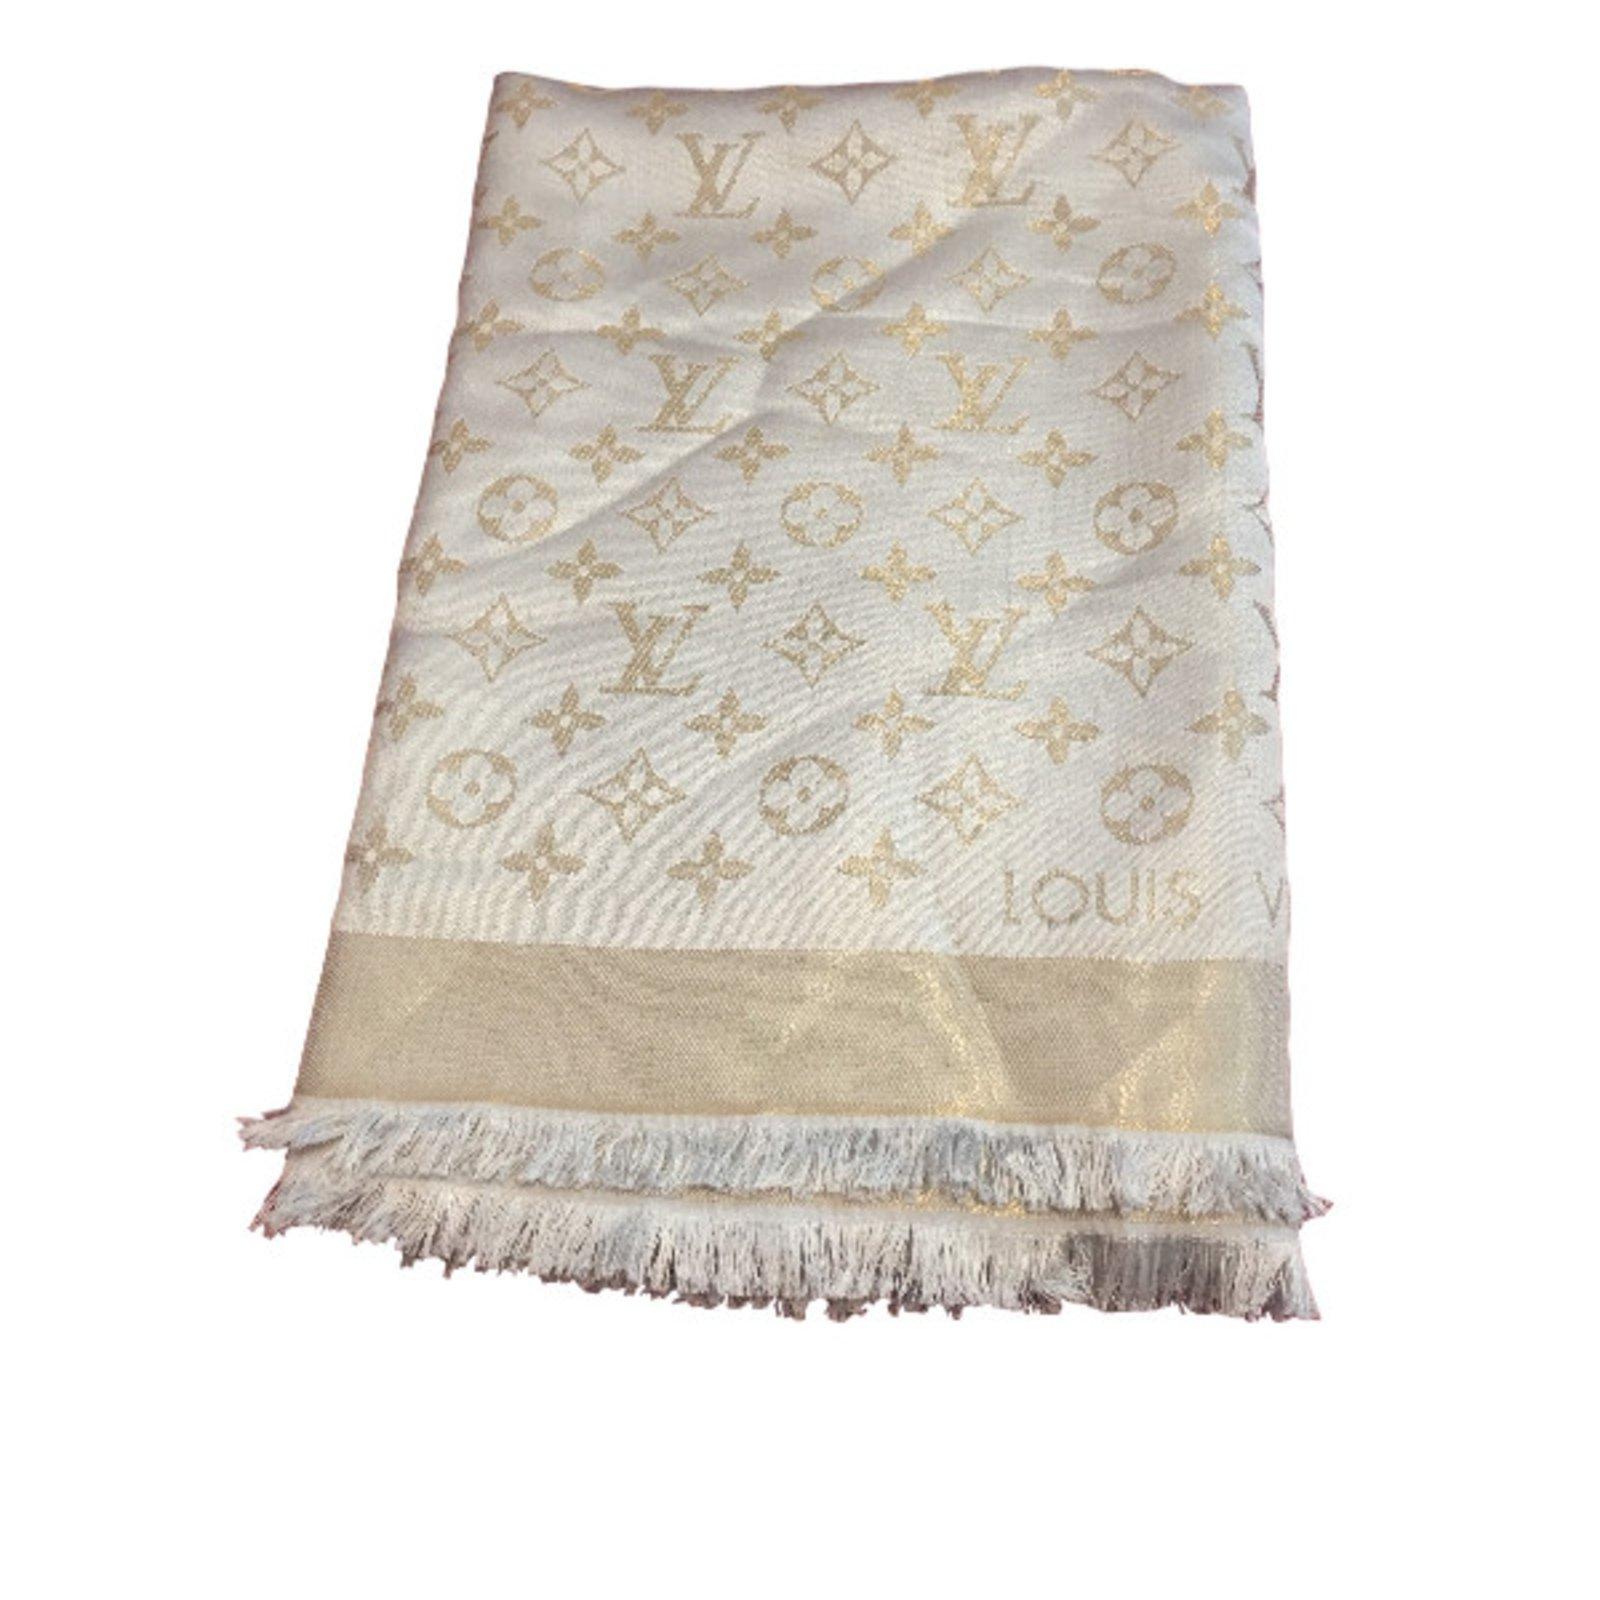 nuovo stile dd238 1c00f Monogramm scarf